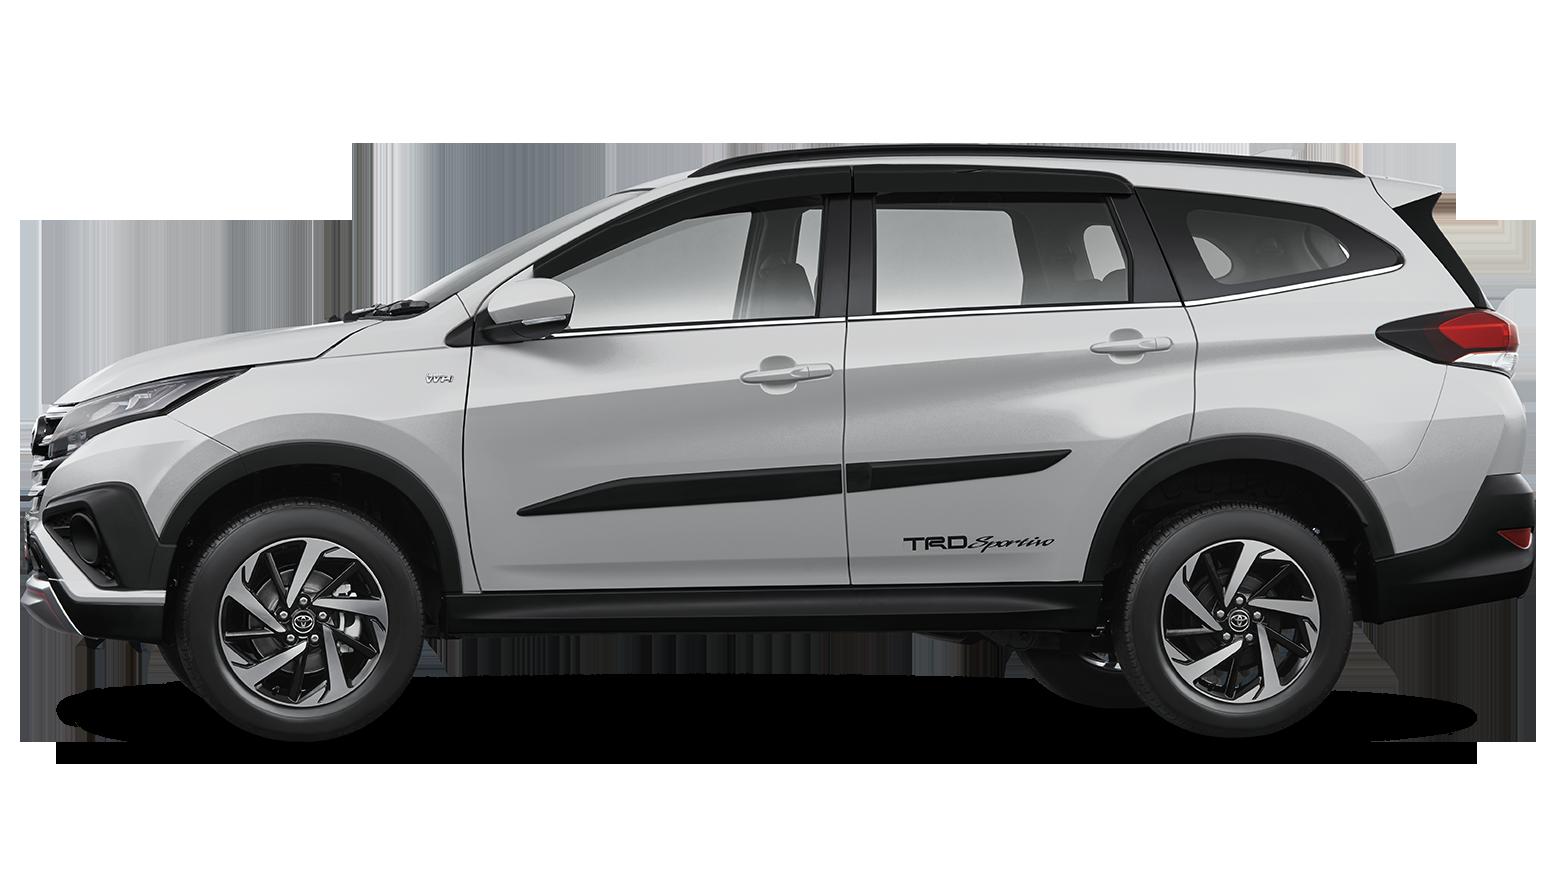 2018-Toyota-Rush-Indonesia-19.png